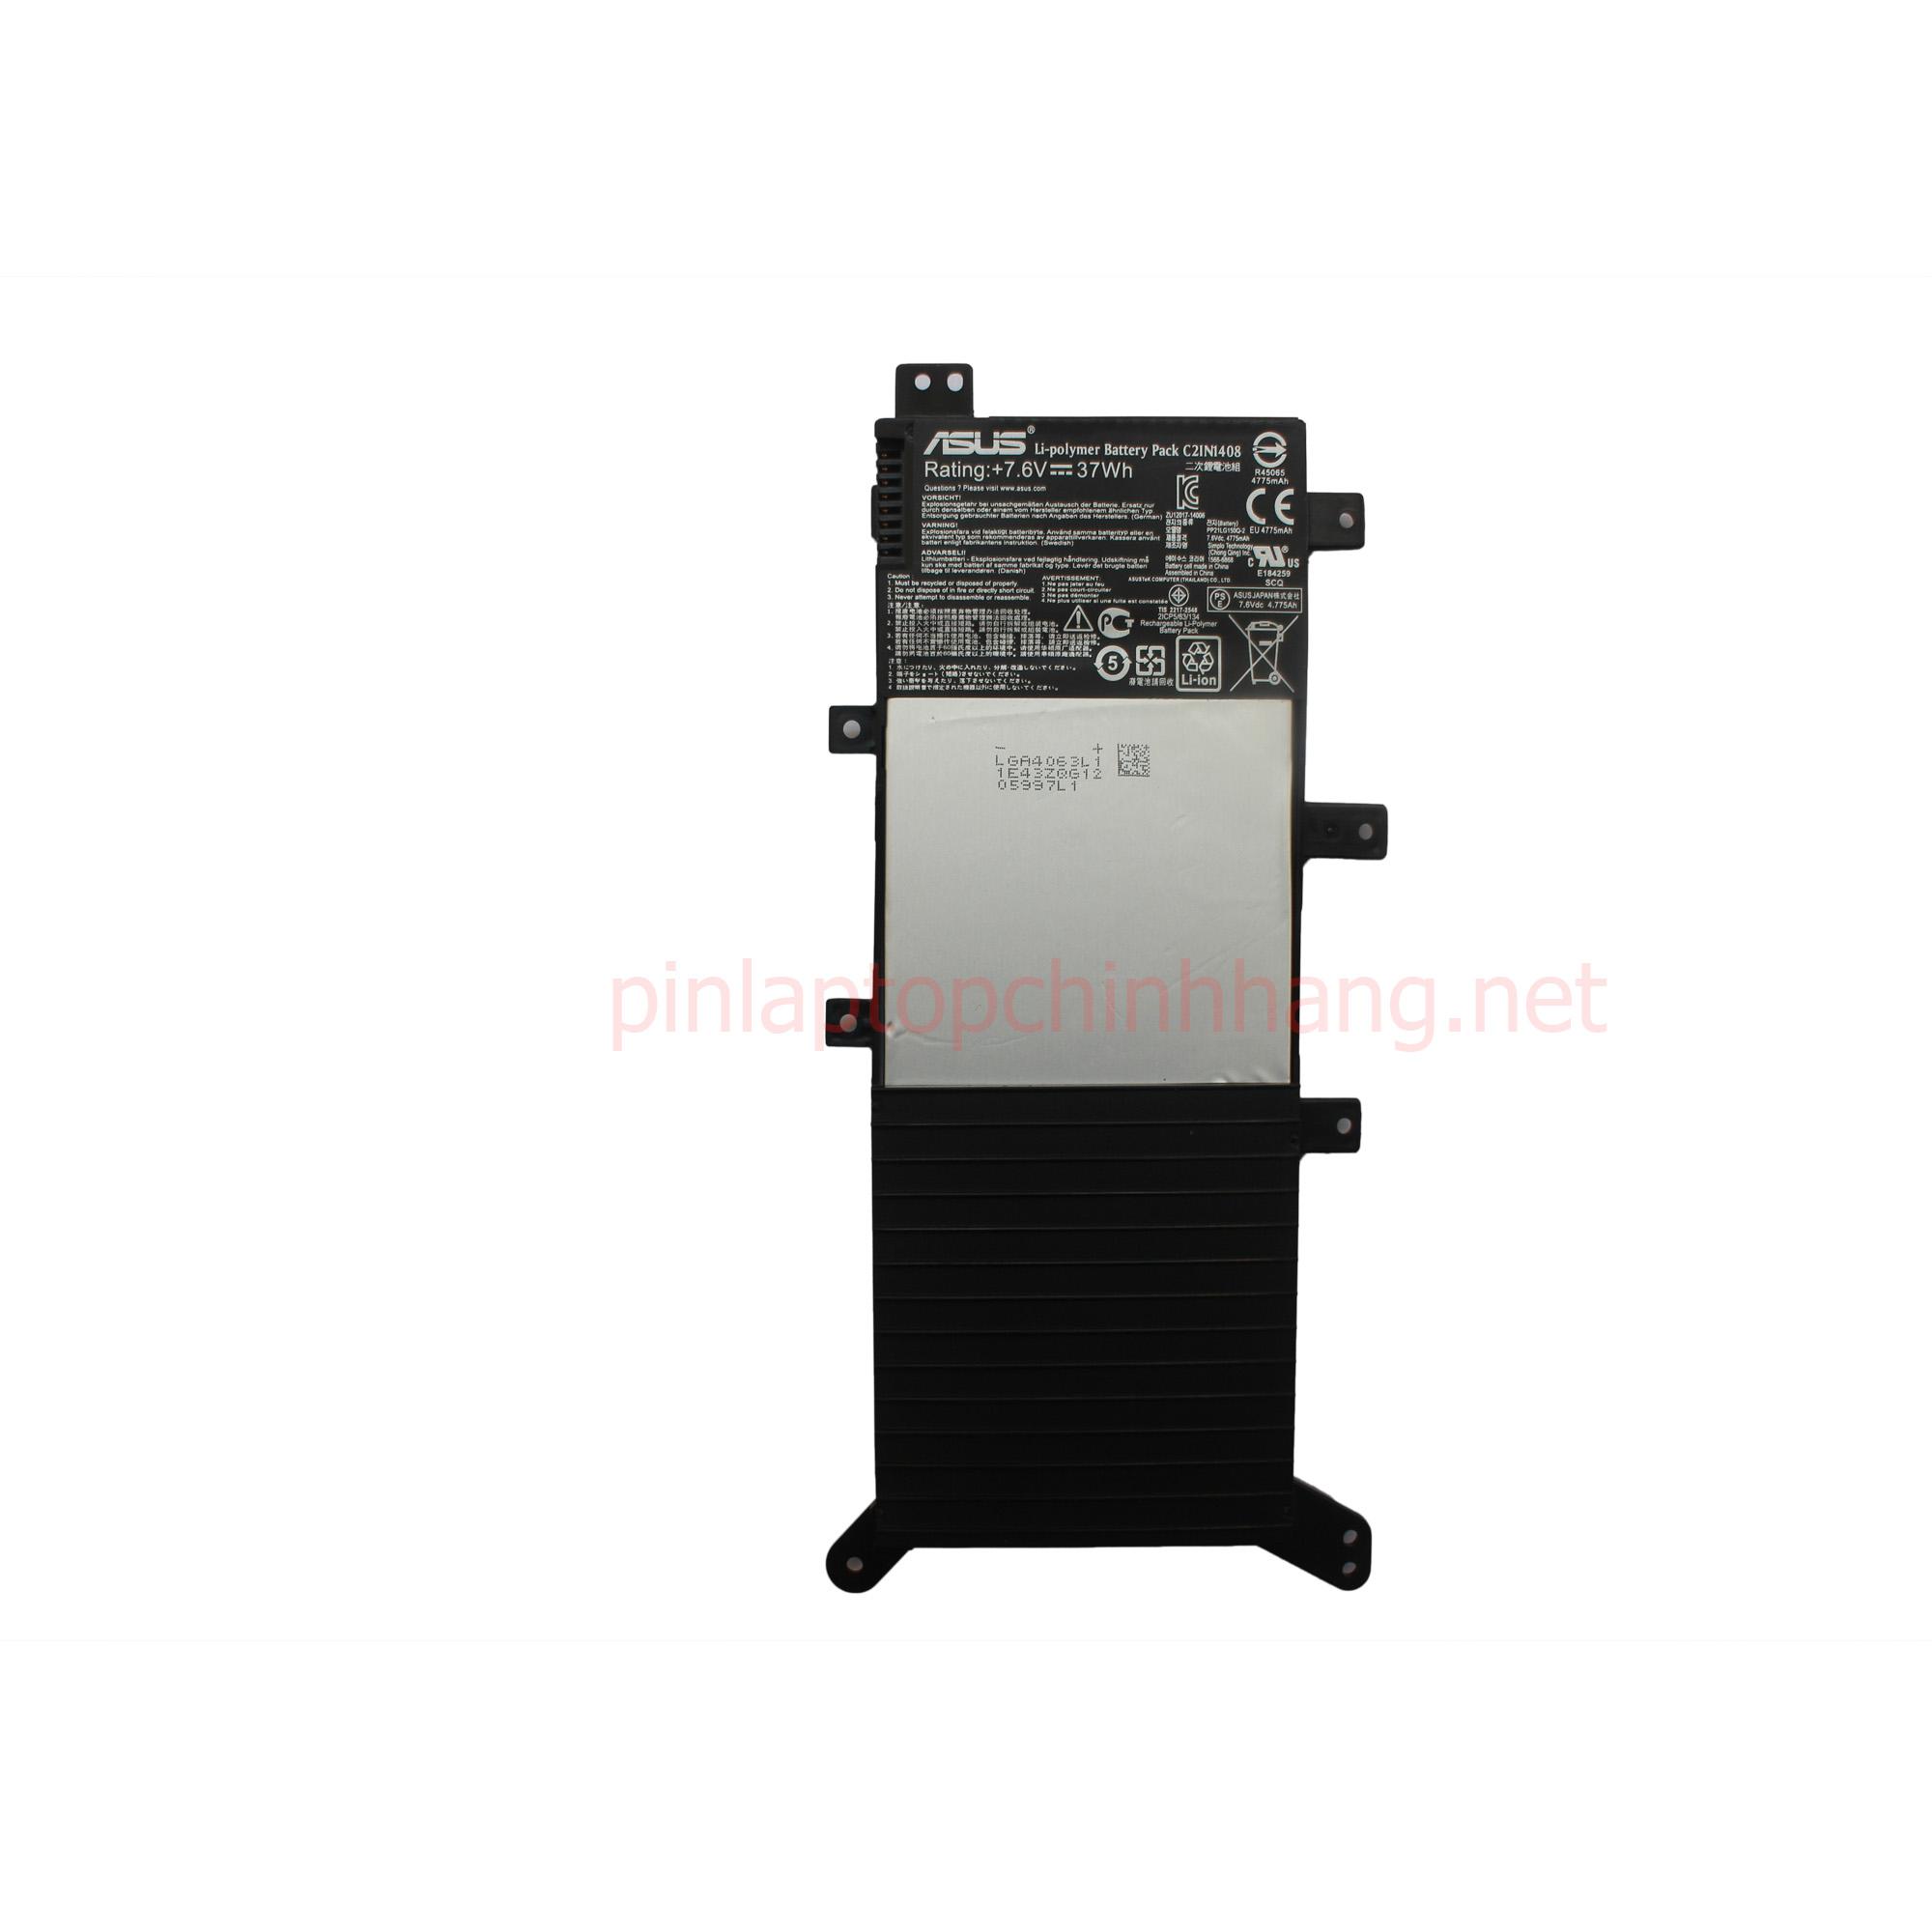 Battery Pin Laptop Chính Hãng ASUS K555L X555LN VivoBook 4000 C21N1408